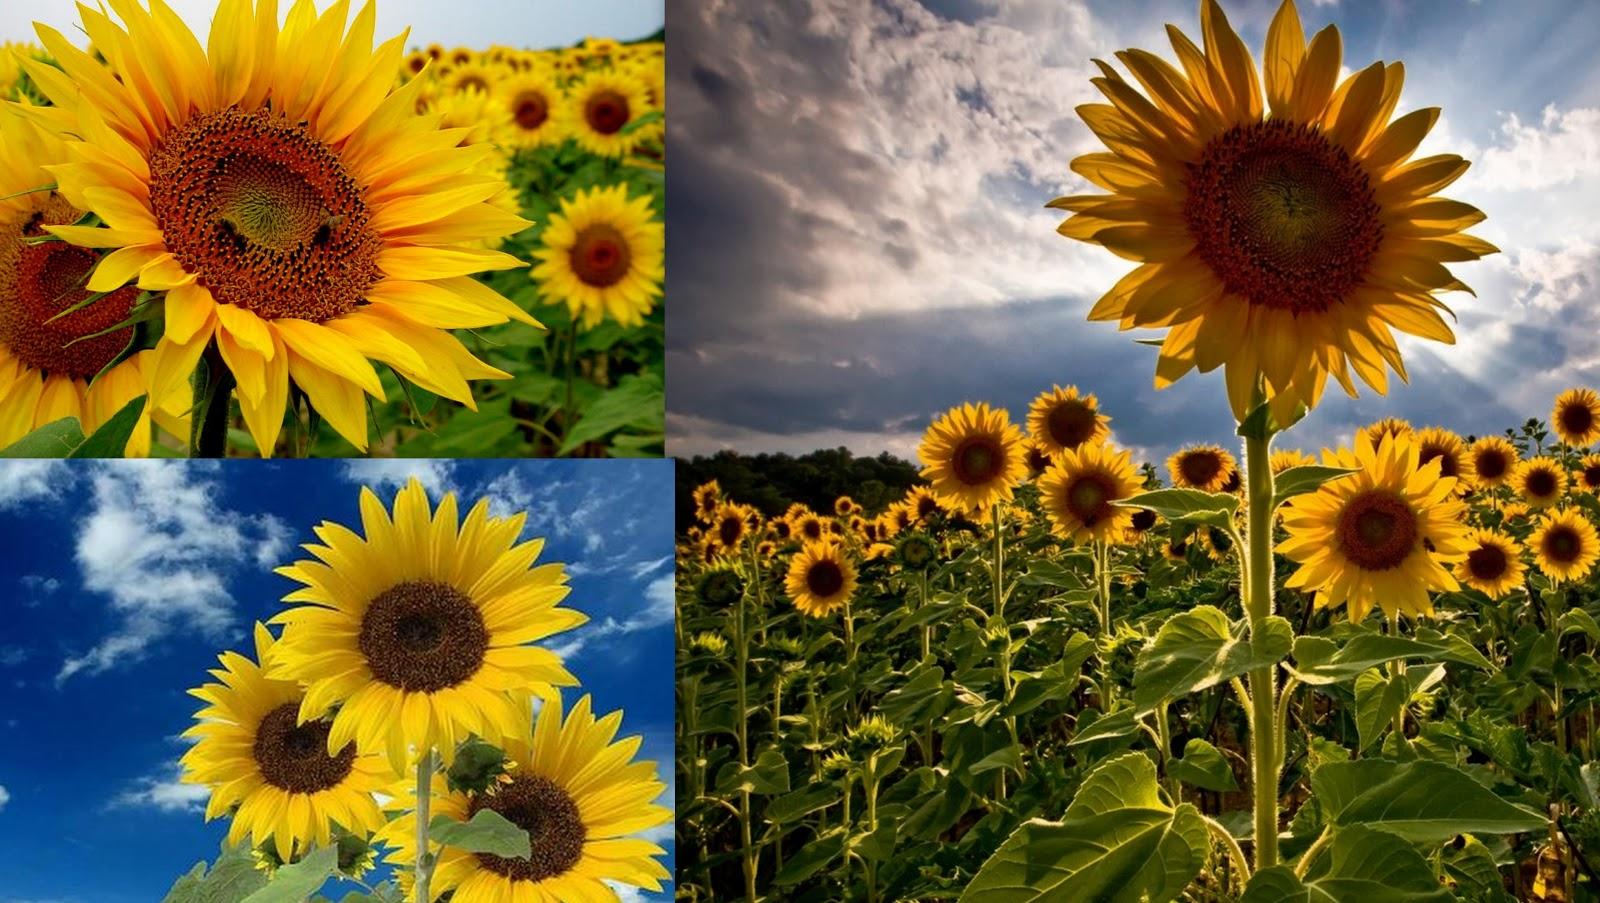 Flor del sol o girasol para curar el alma - Flores que aguantan el sol ...